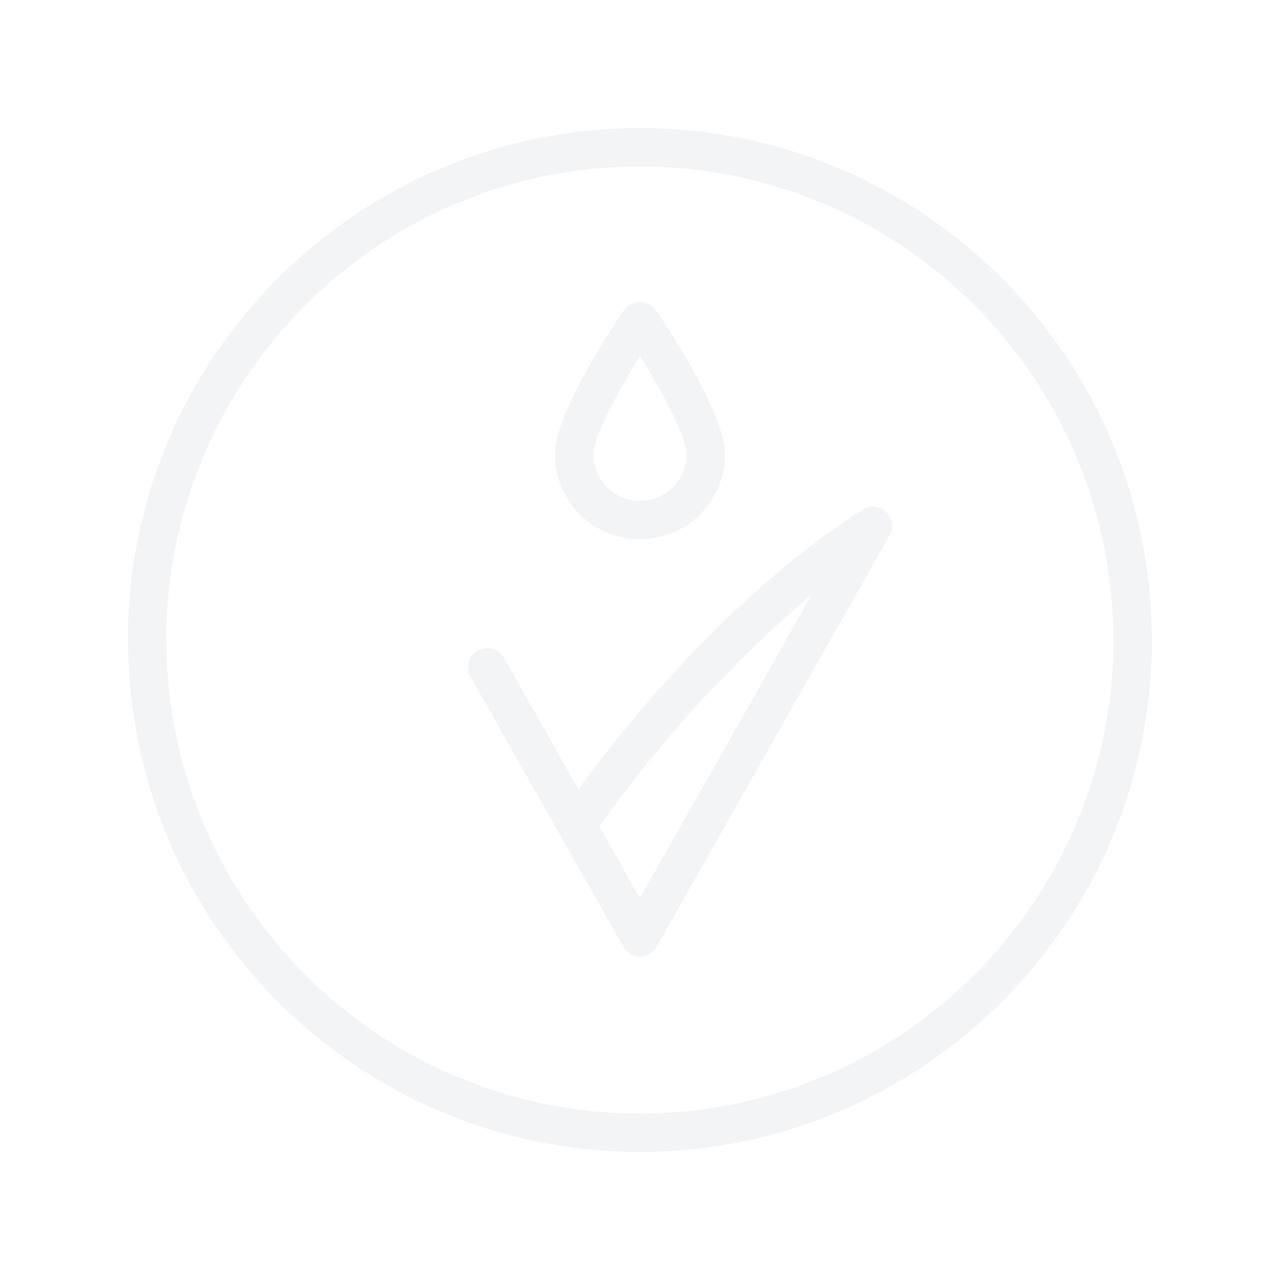 ALESSANDRO Hand!Spa Lemon Delicate Hand Cream 10ml